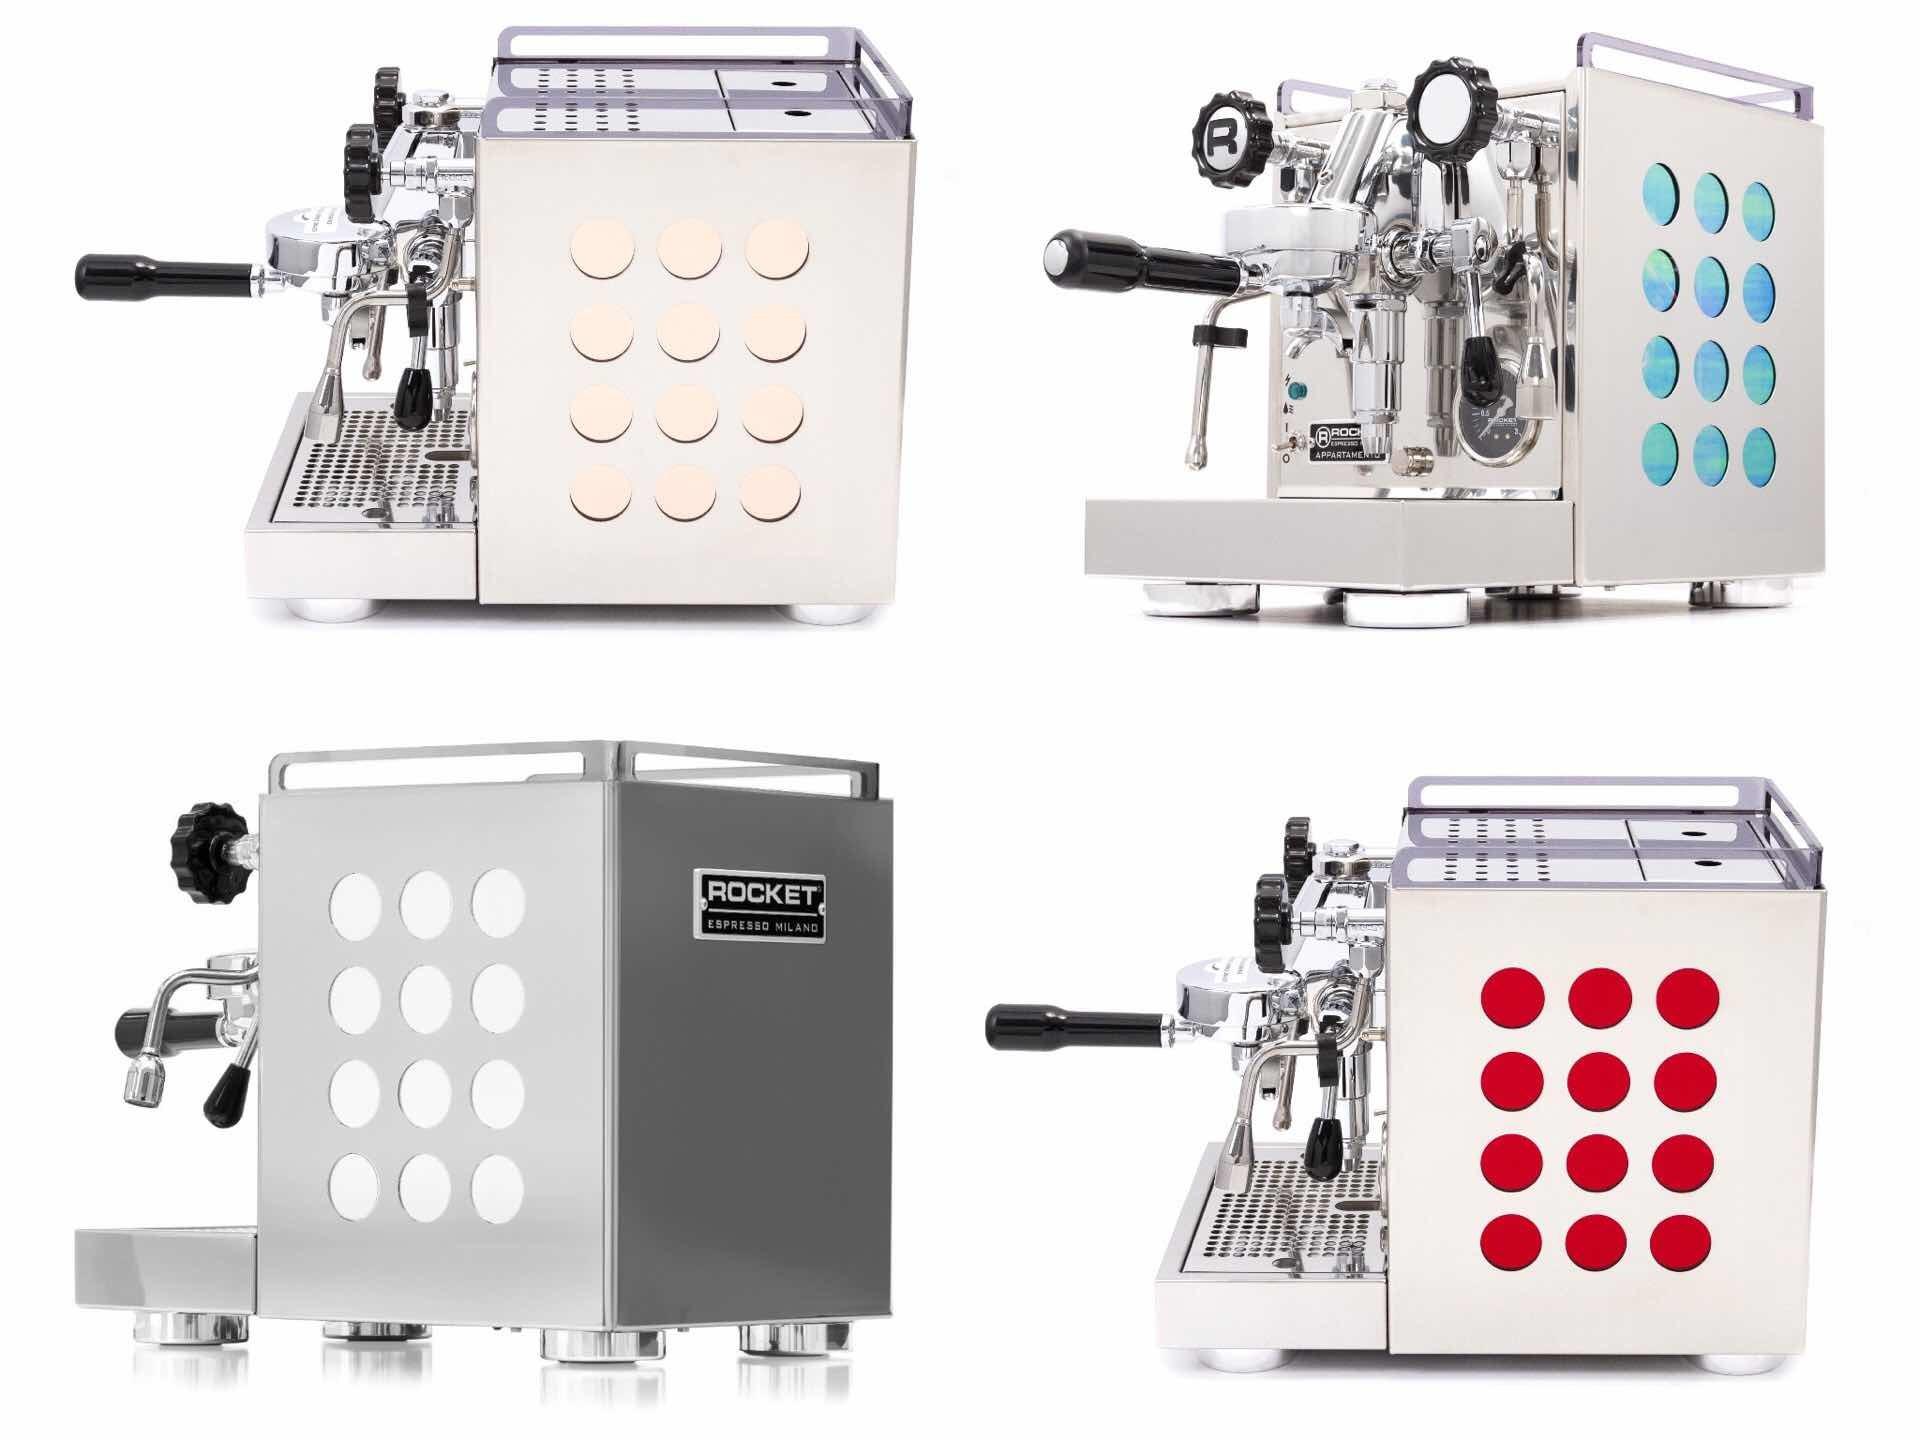 rocket-milano-appartamento-espresso-machine-colors